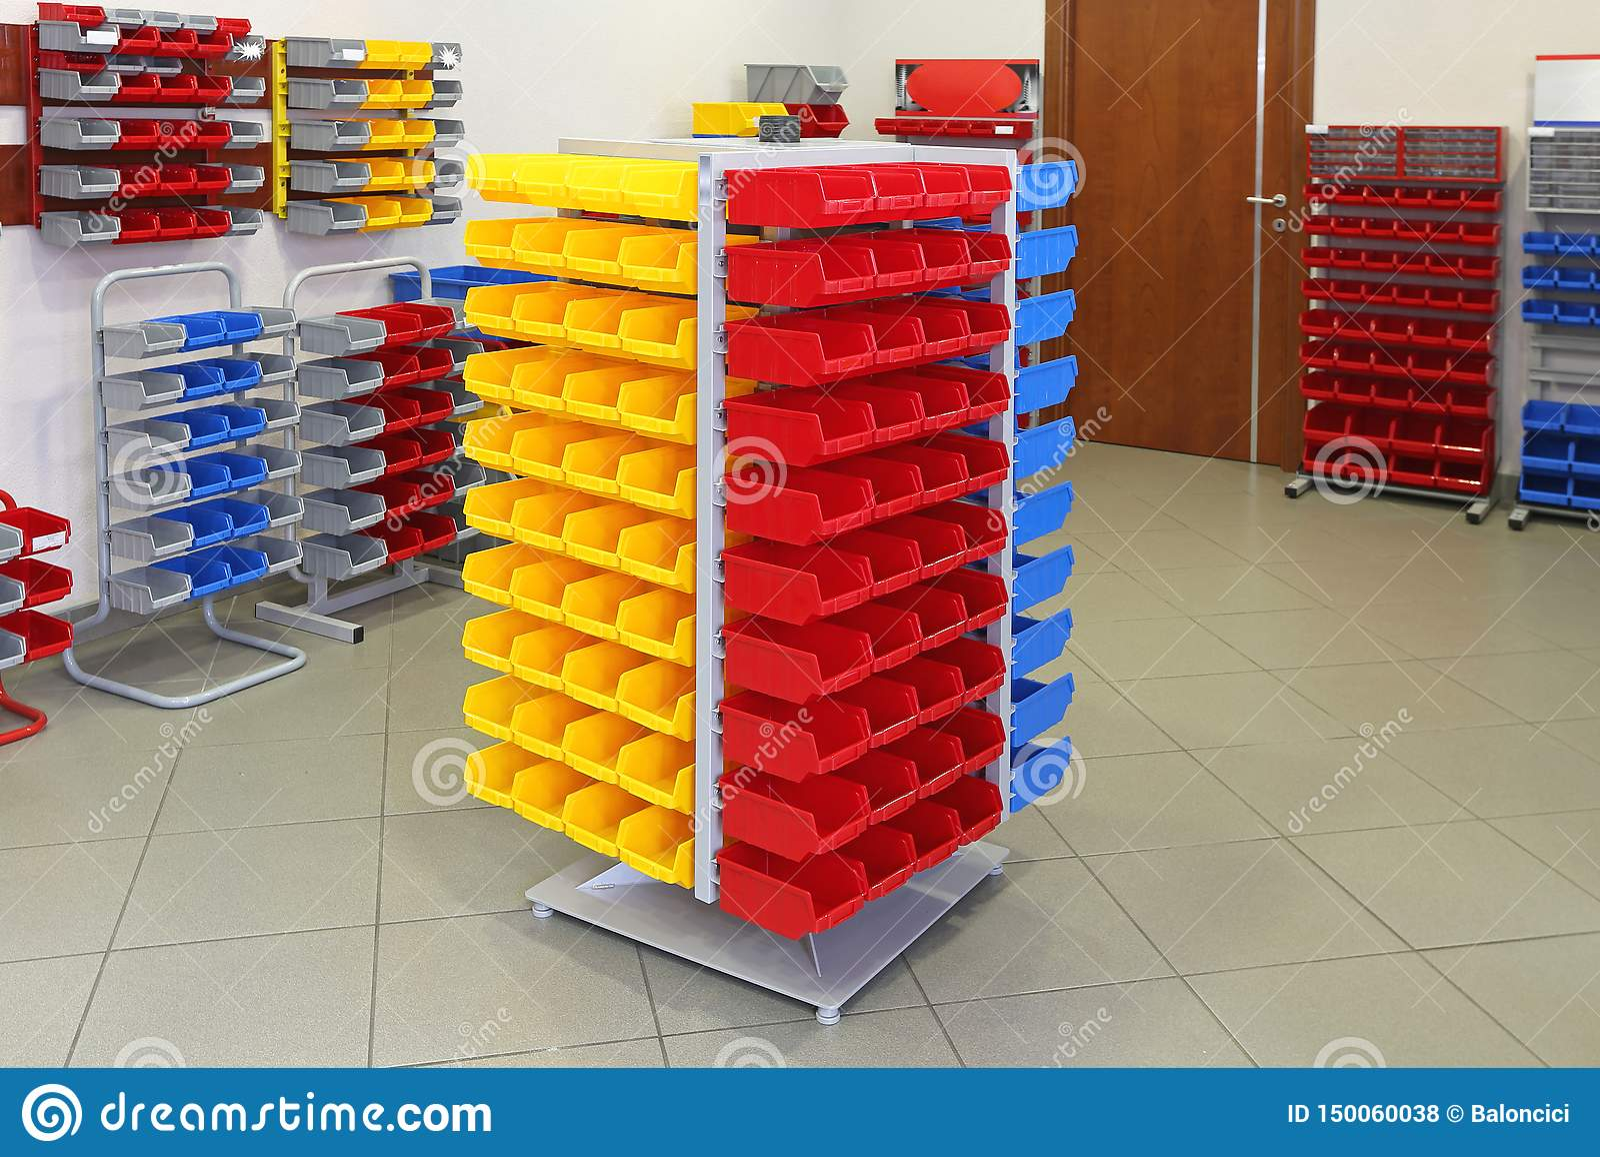 Universal Plastic Boxes